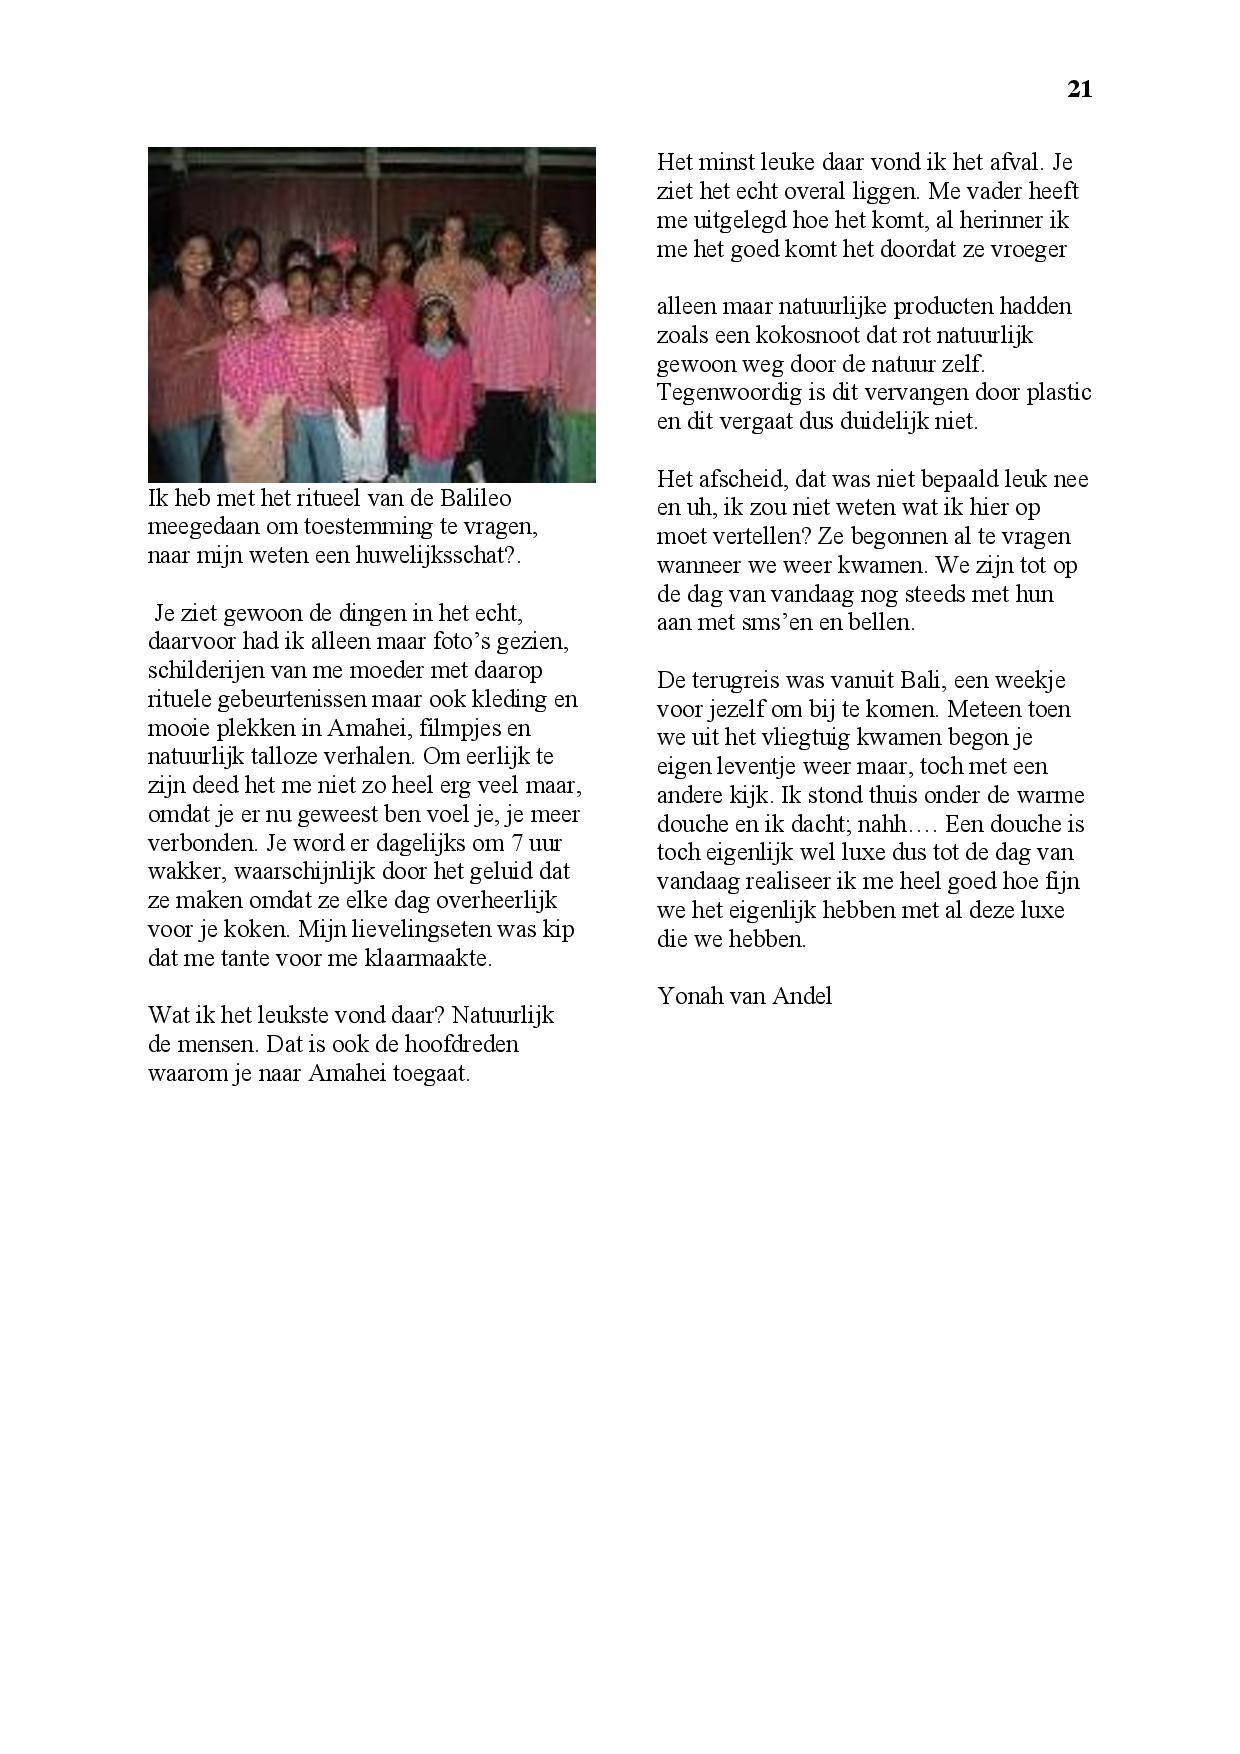 Saka Mese 3e jaargang nr. 02-2007 definitieve webversie-page-021